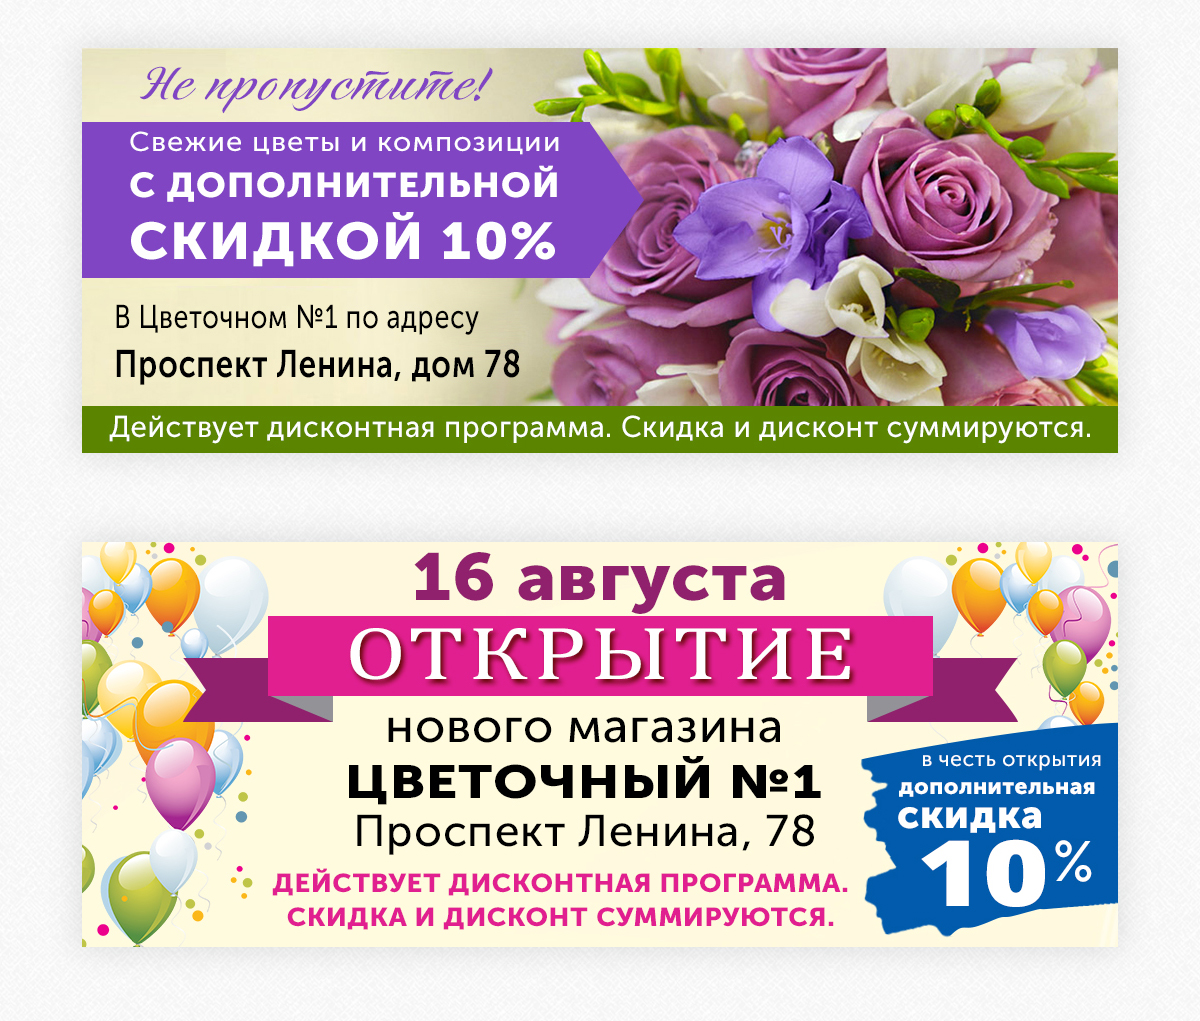 Баннеры для магазина цветов